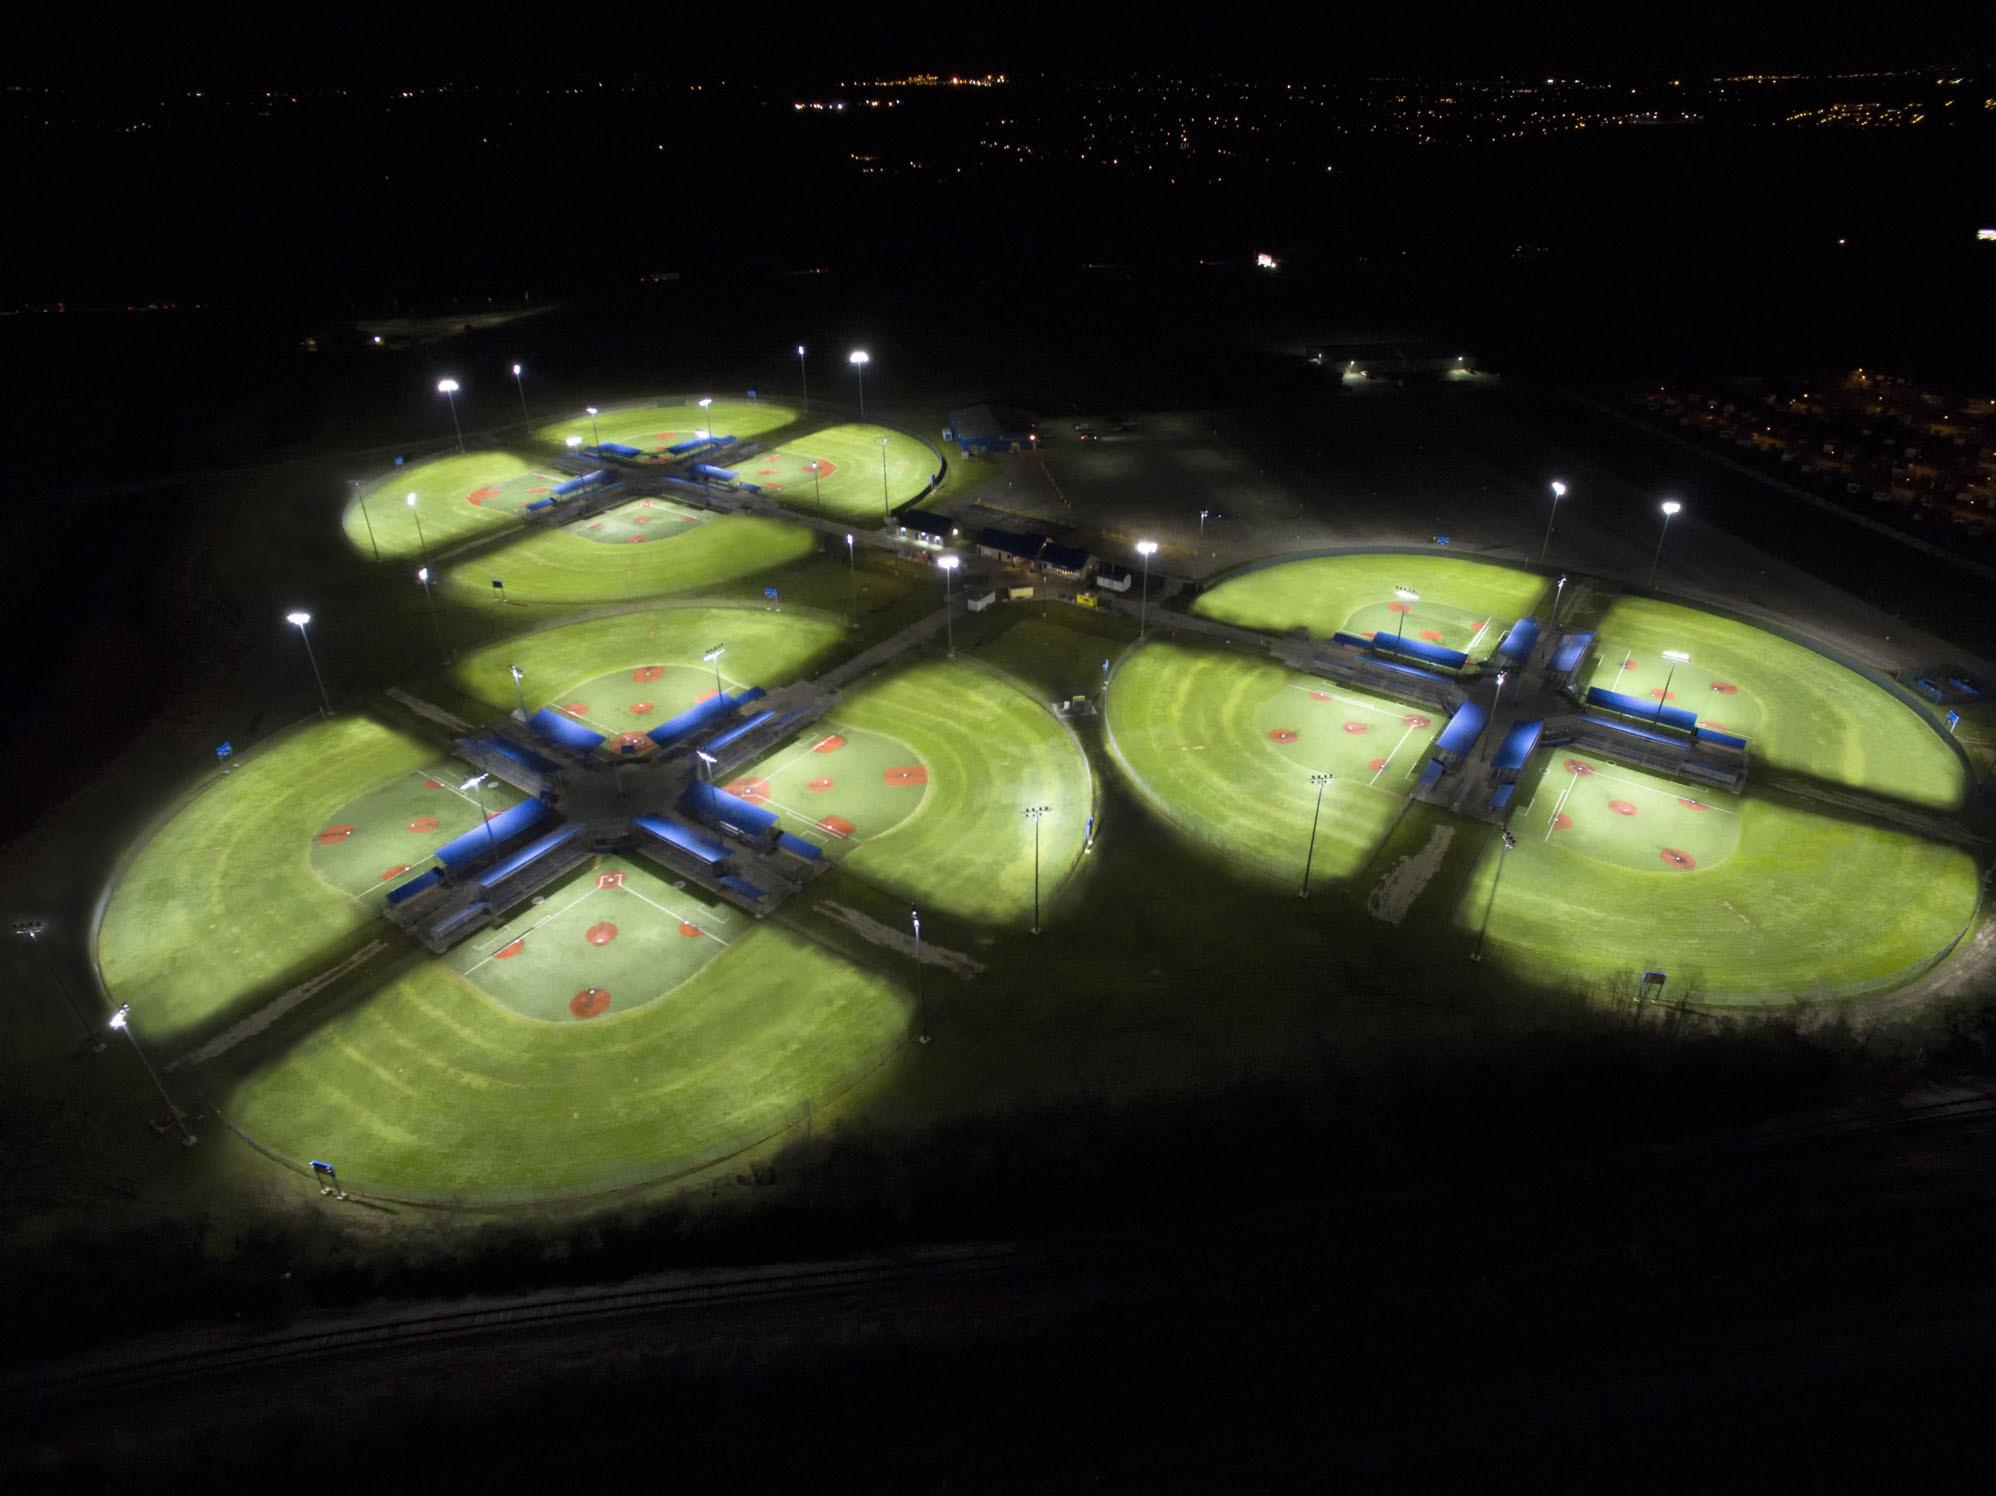 Eaton's advanced Ephesus LED lighting and controls system illuminates Ford Fields' championship-caliber youth baseball/softball fields. (Photo: Business Wire)